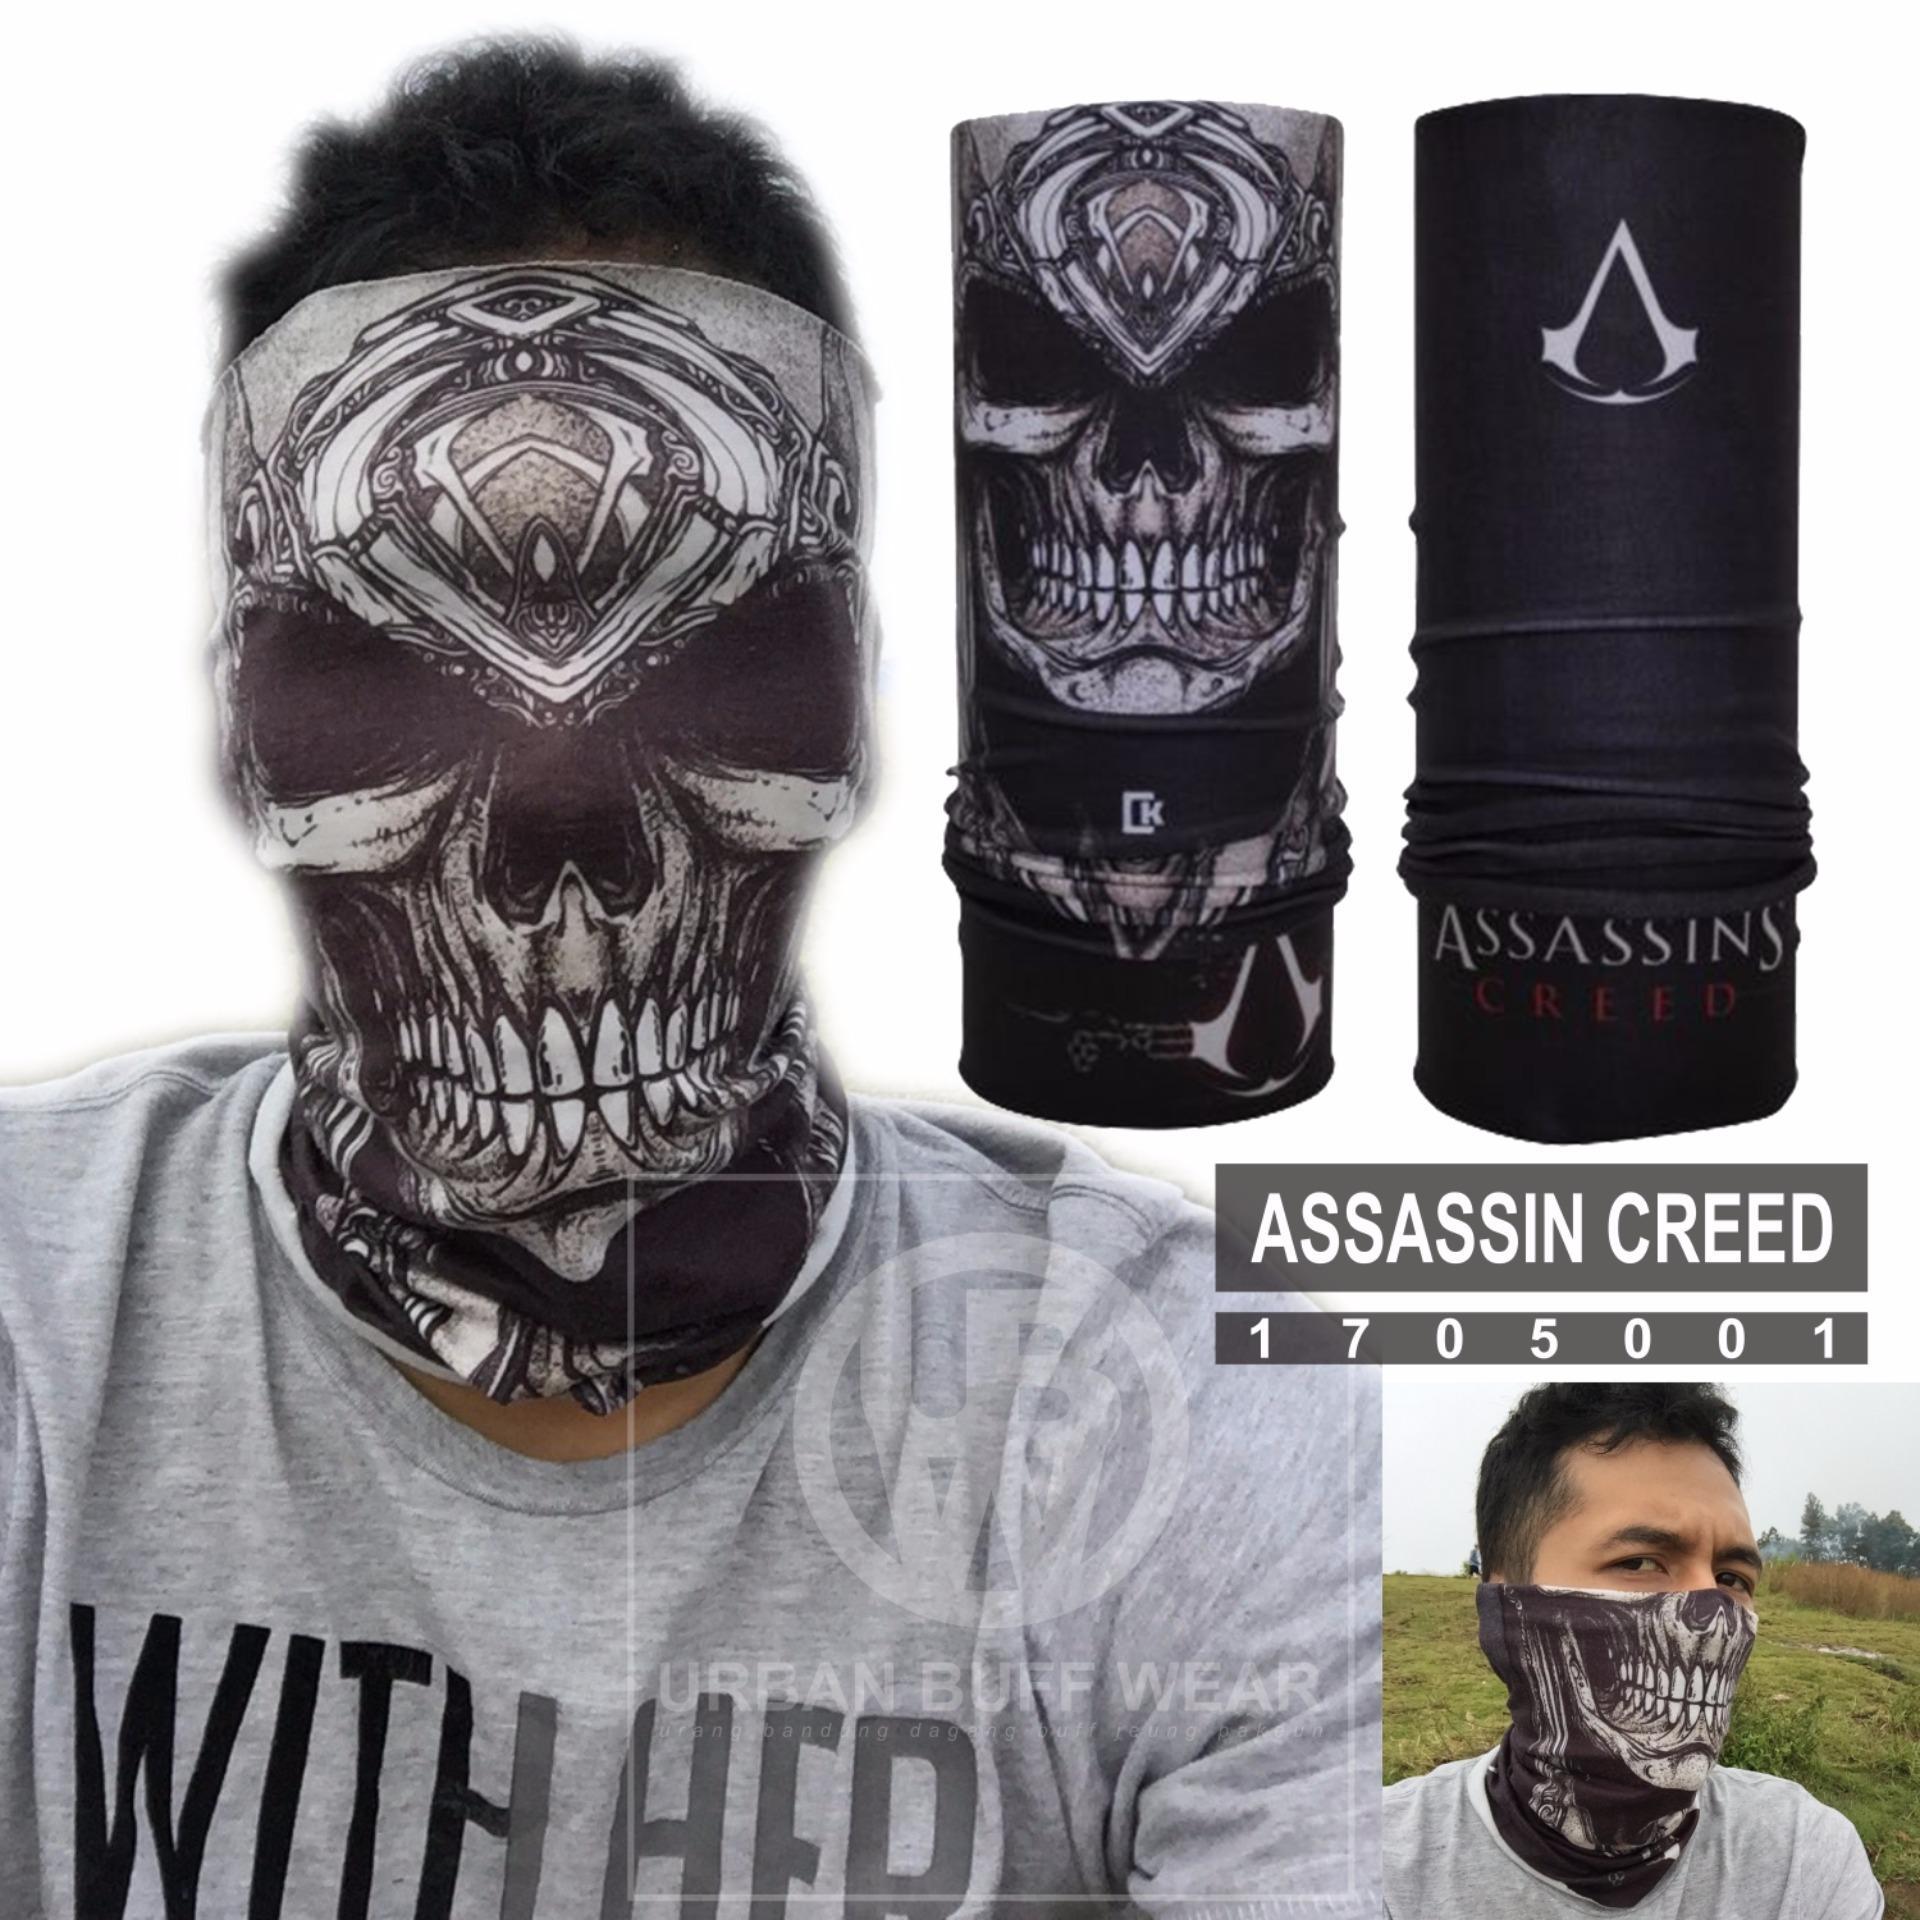 Ck Bandana 1702004 Buff Masker Multifungsi Motif Imperial Moustache Polar 1705001 Assassin Creedskull